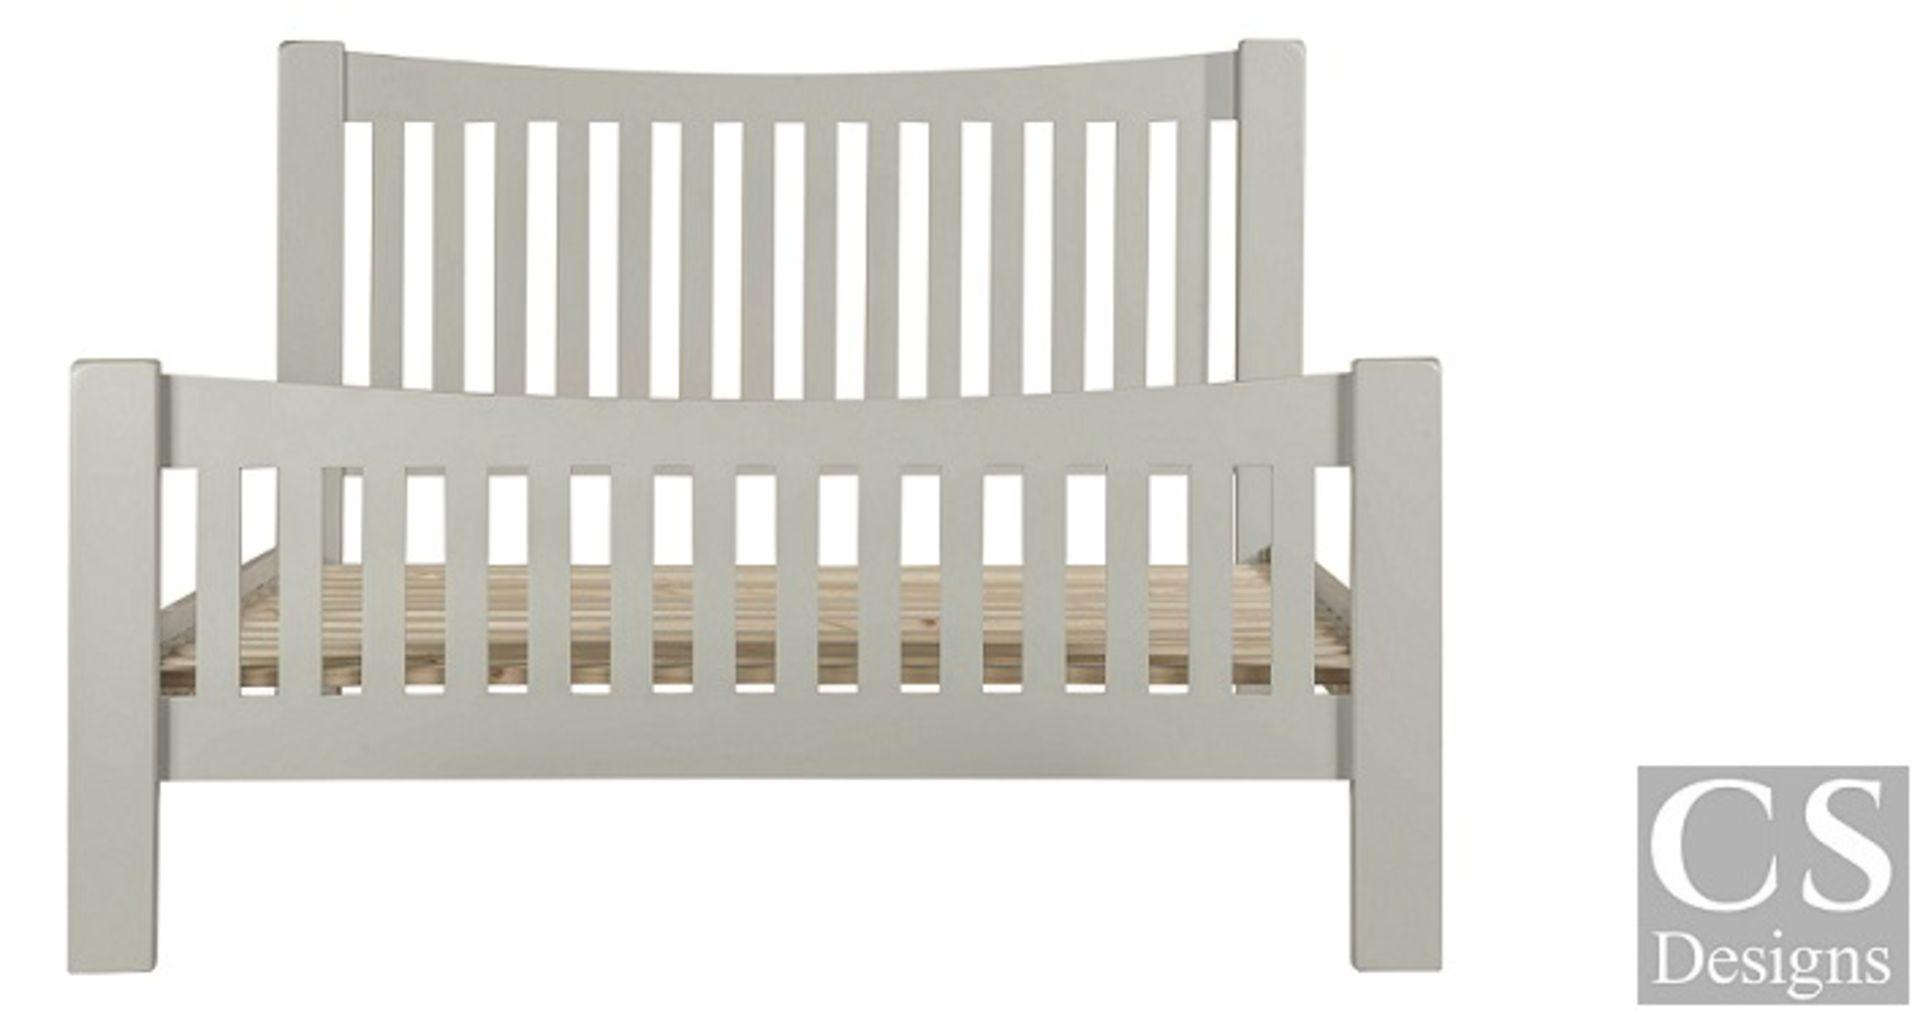 "+ VAT Brand New CS Designs ""Daylesford"" King Size Bed Frame With Natural Oak & Solid Hardwood - Image 2 of 3"